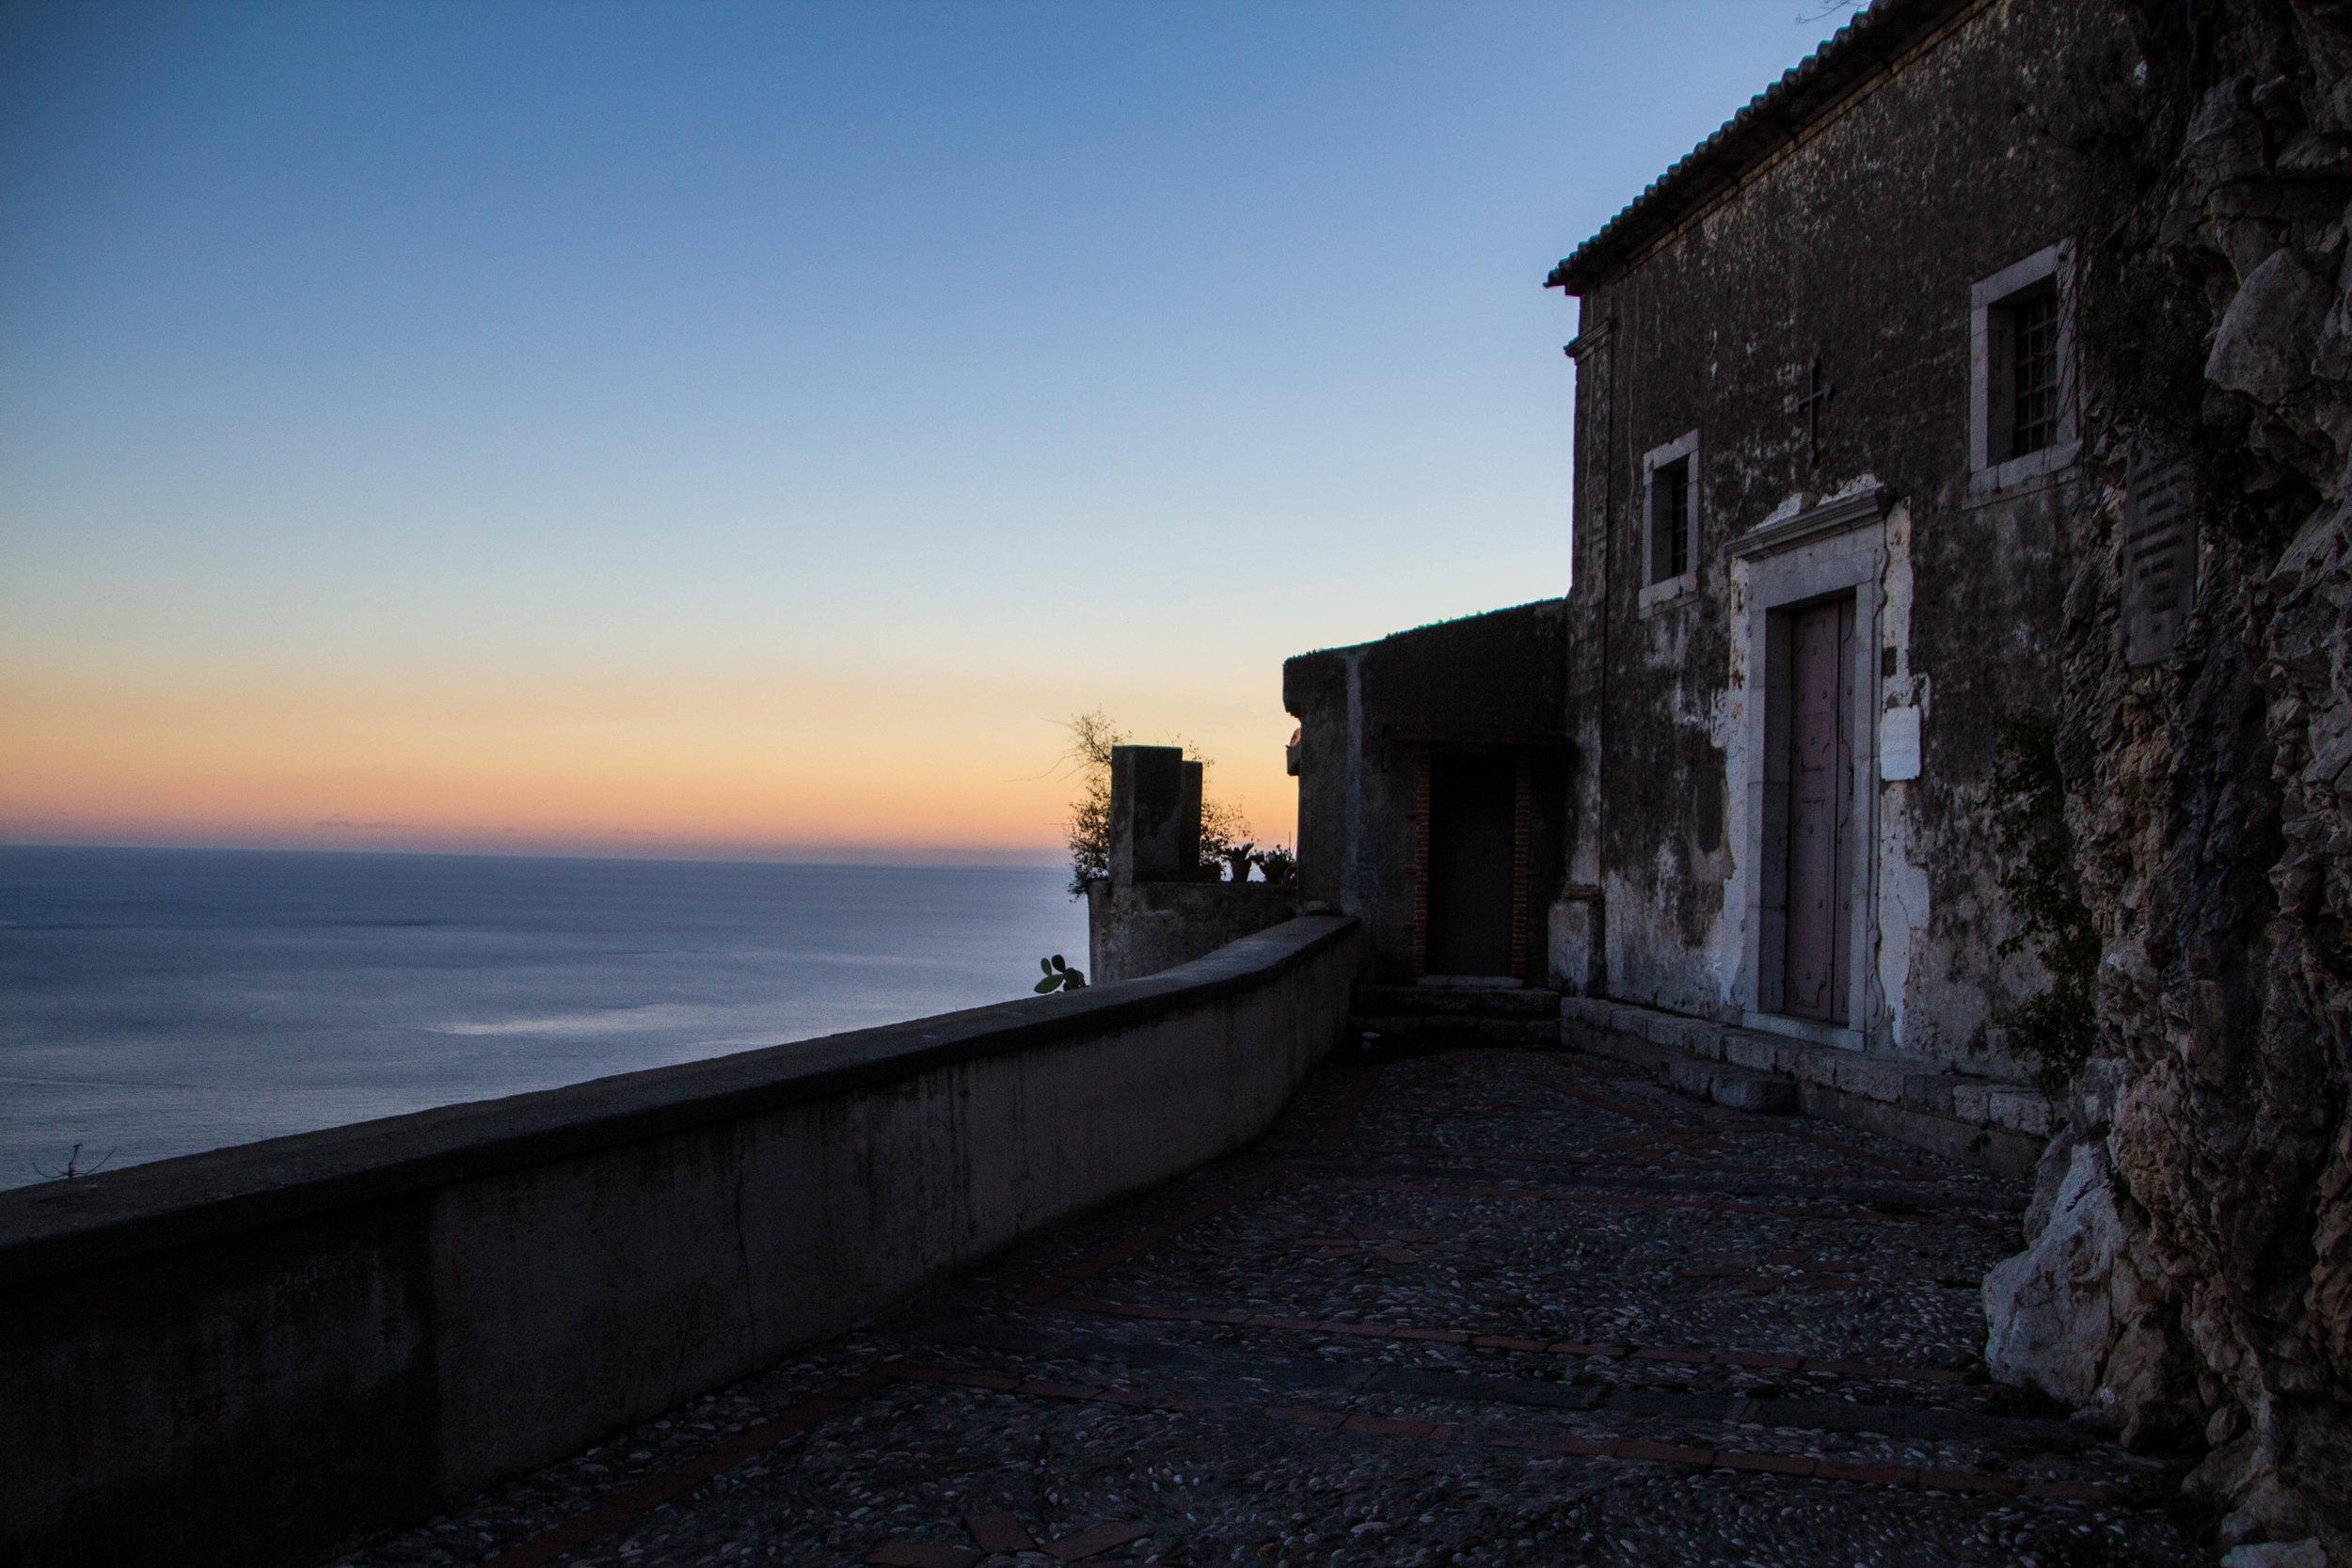 sunset-photography-taormina-sicily-12.jpg